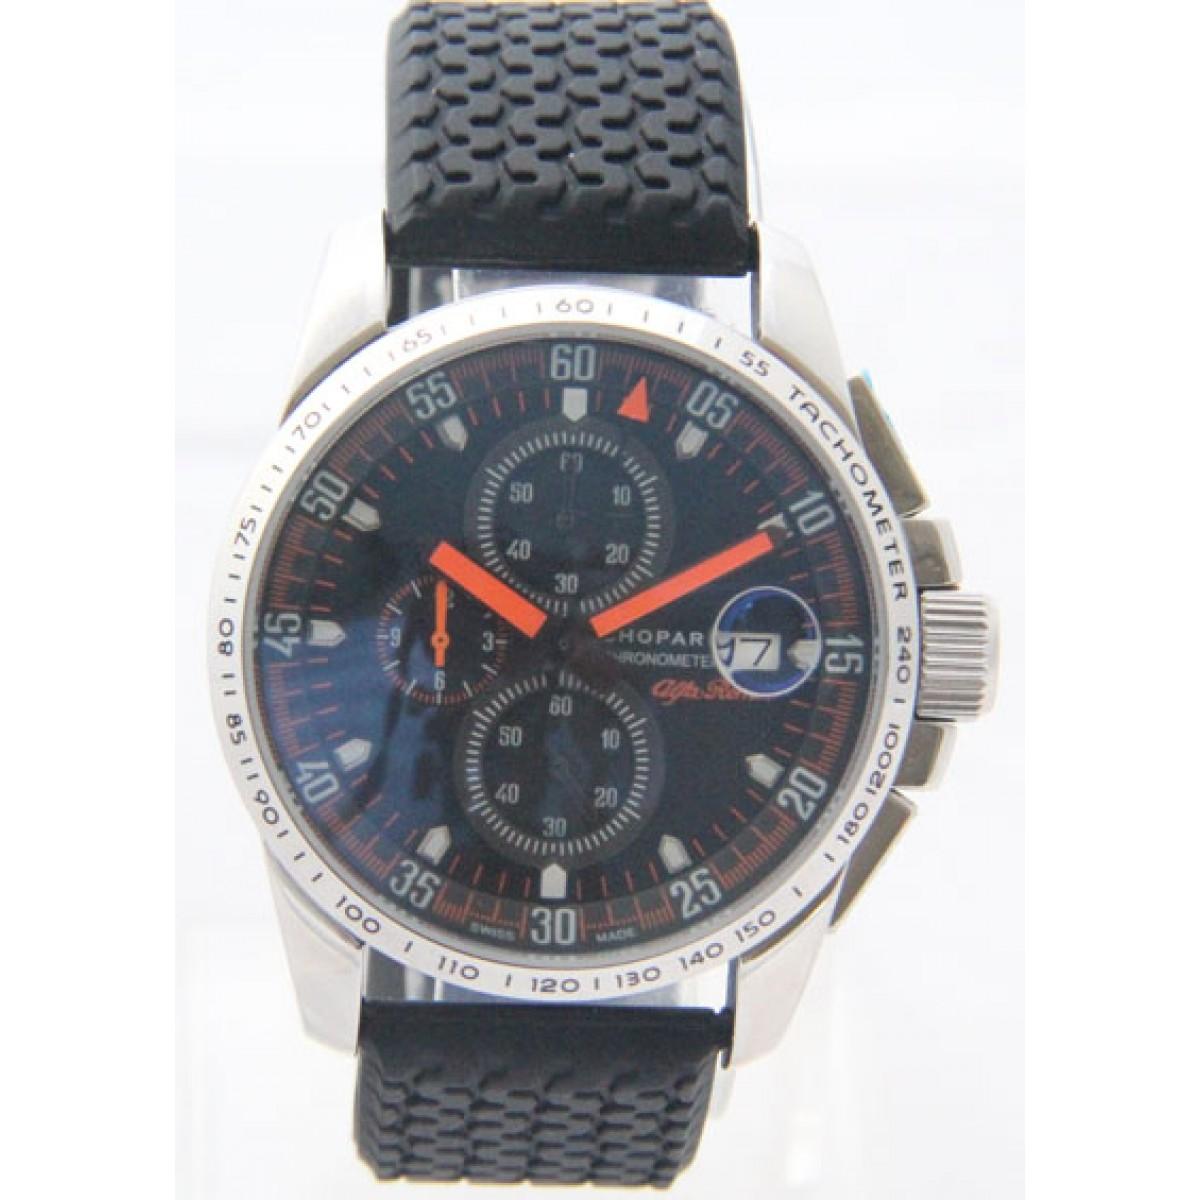 e817ccc6562 Relógio Réplica Chopard Alfa Romeo Preto Laranja